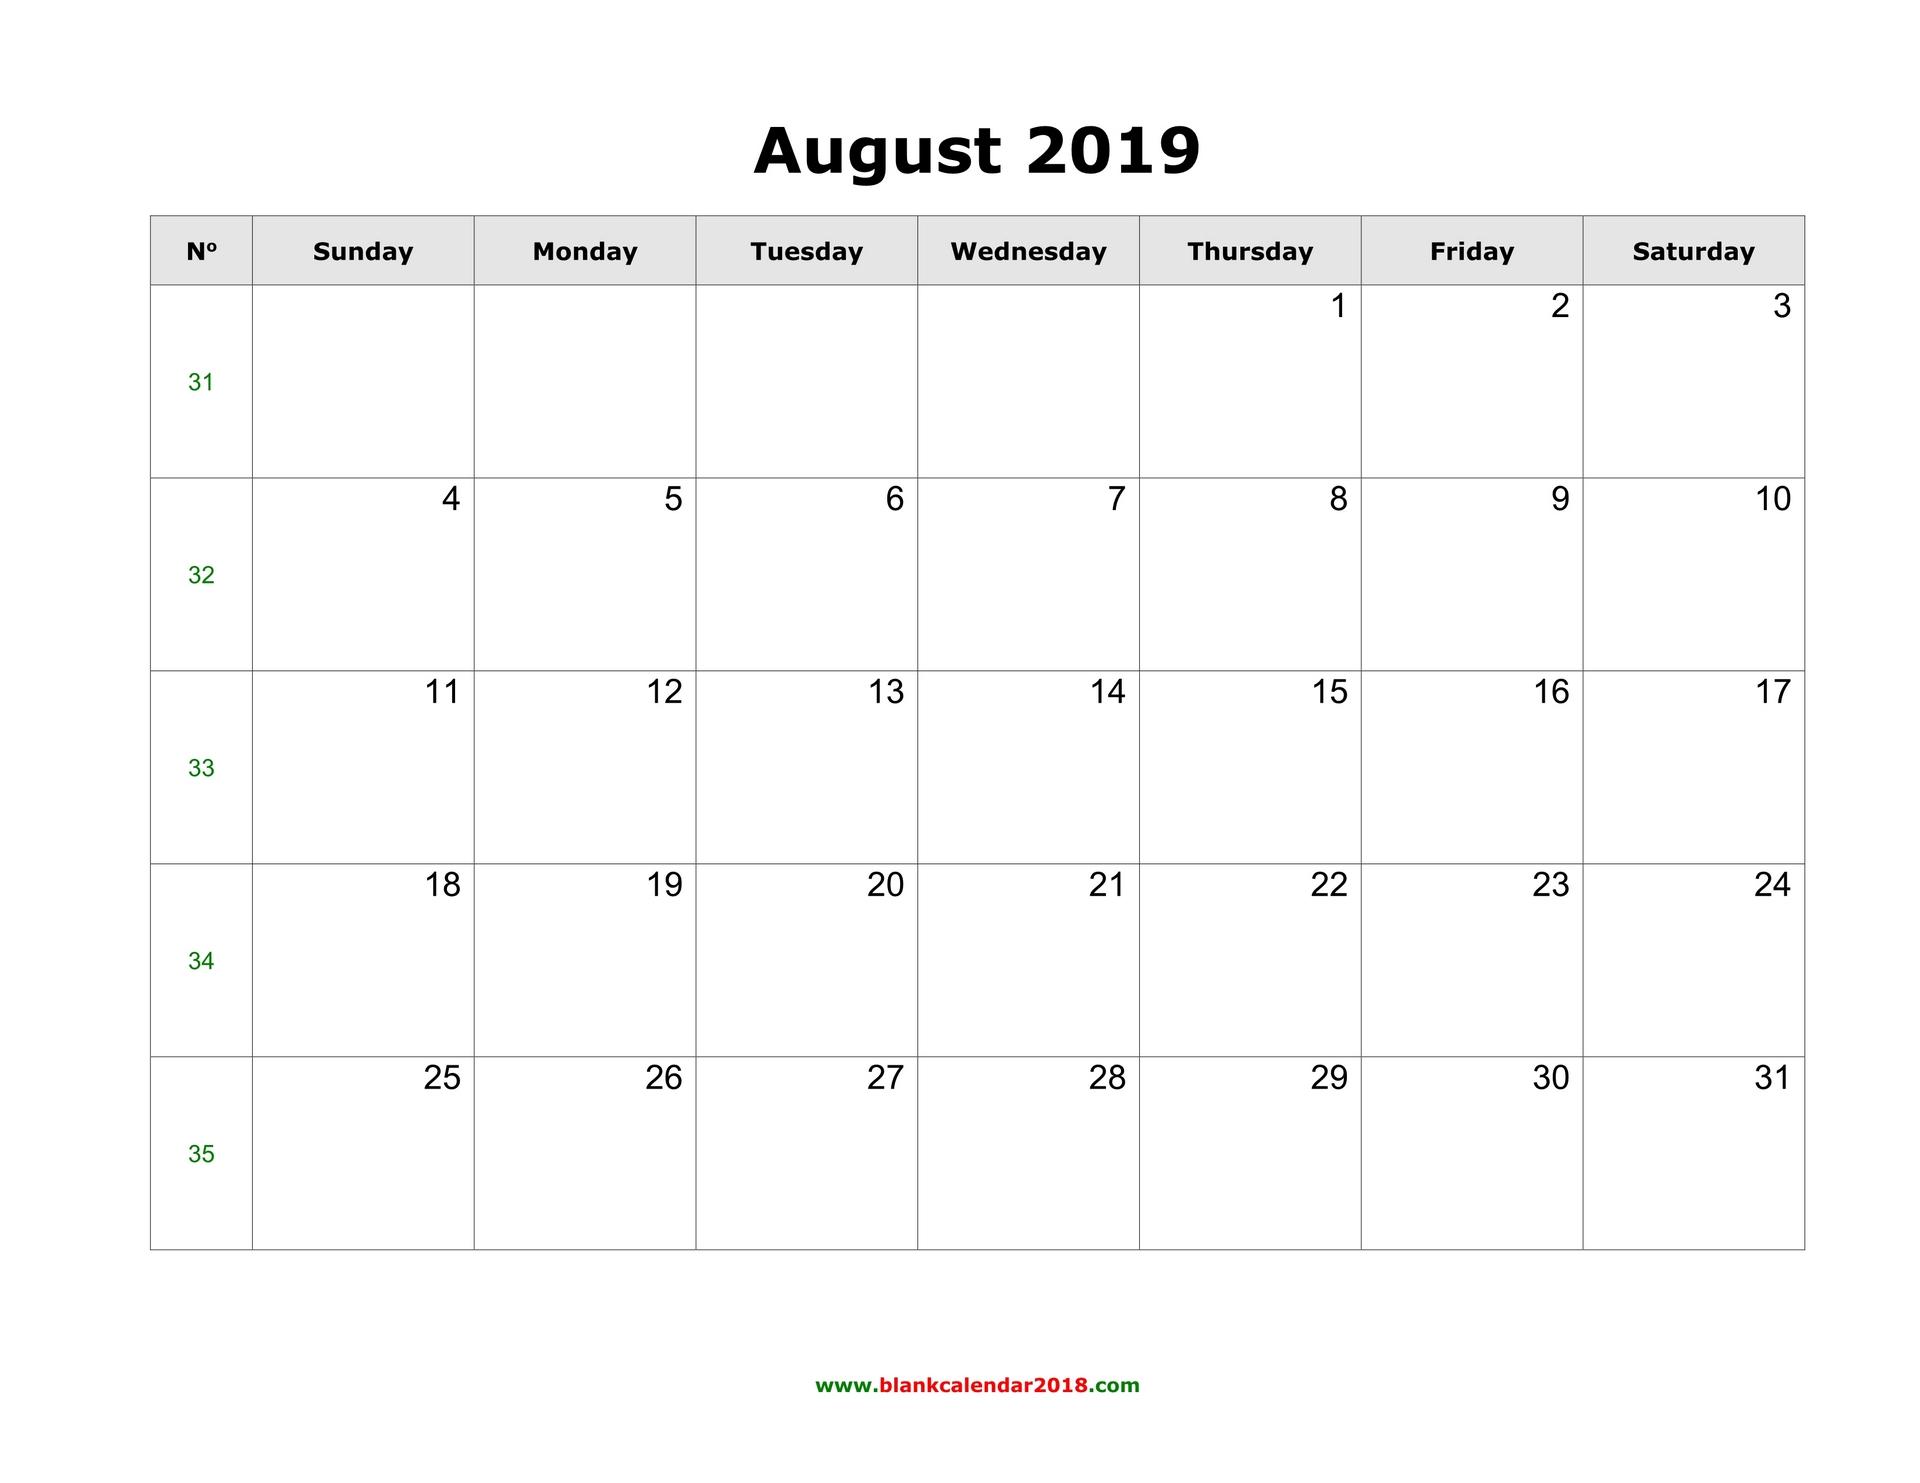 Blank Calendar For August 2019 within Calendar Blanks August Through October 2019